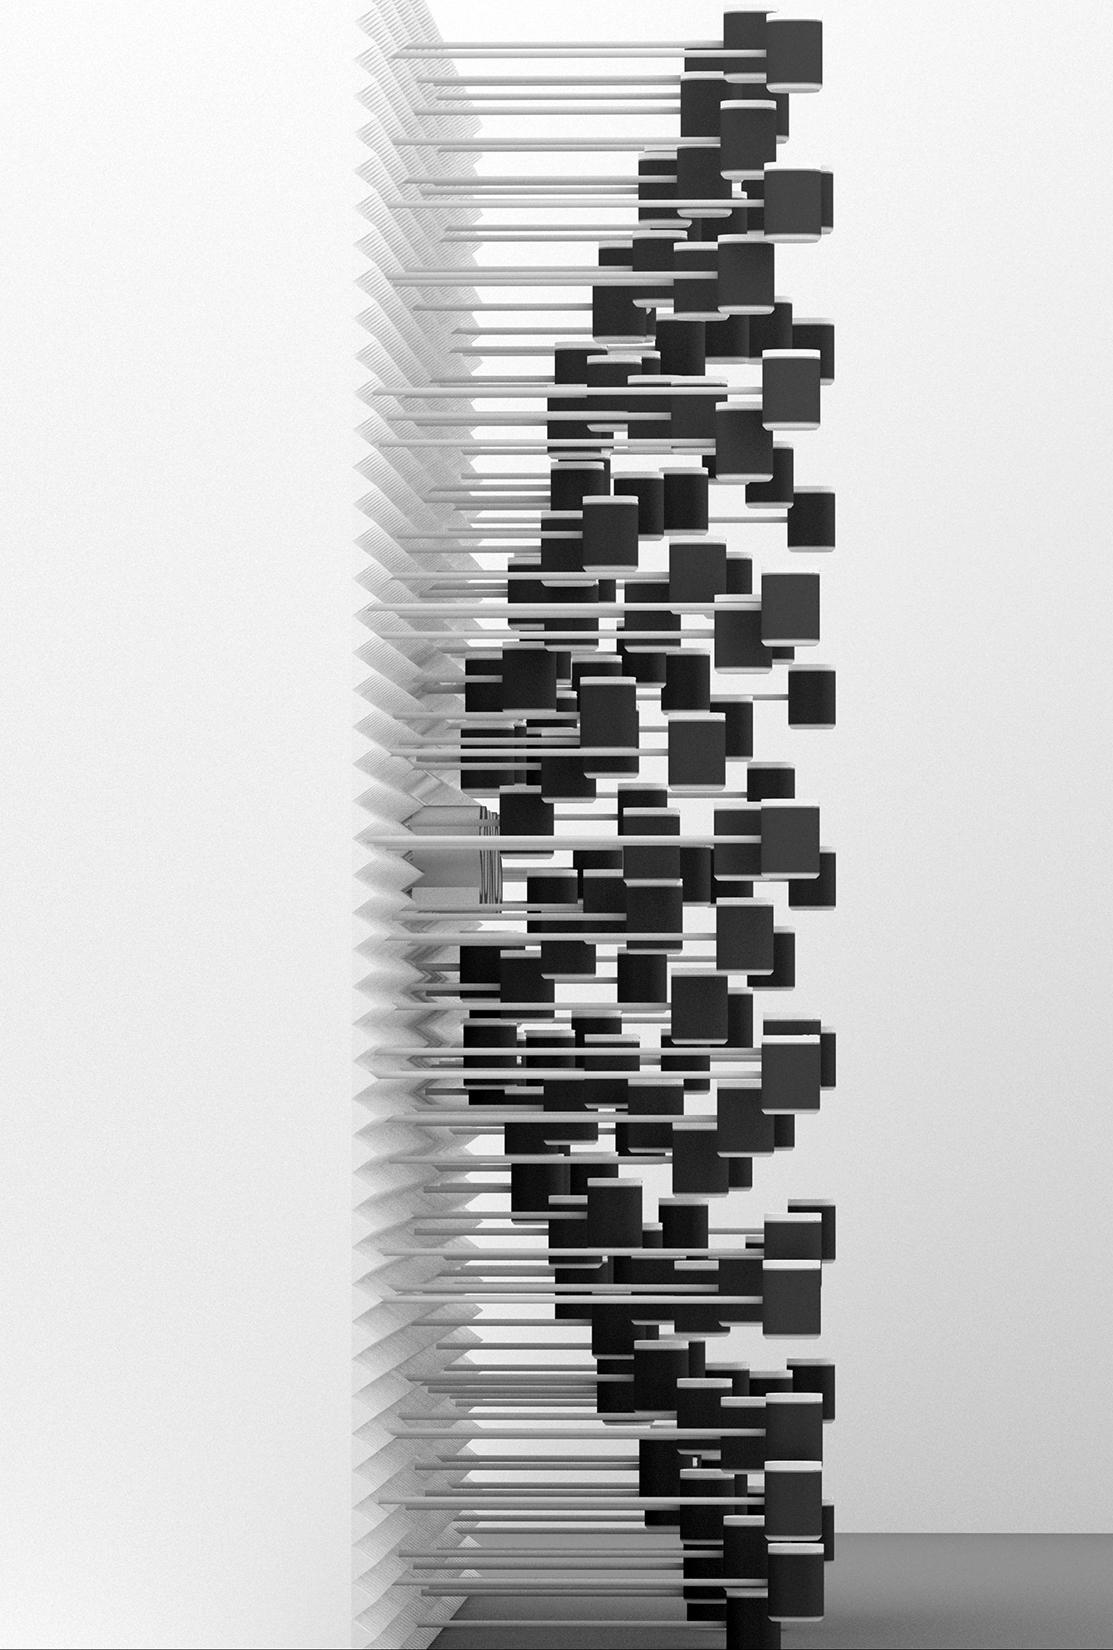 Sonos_4_flat wall_side view.jpg